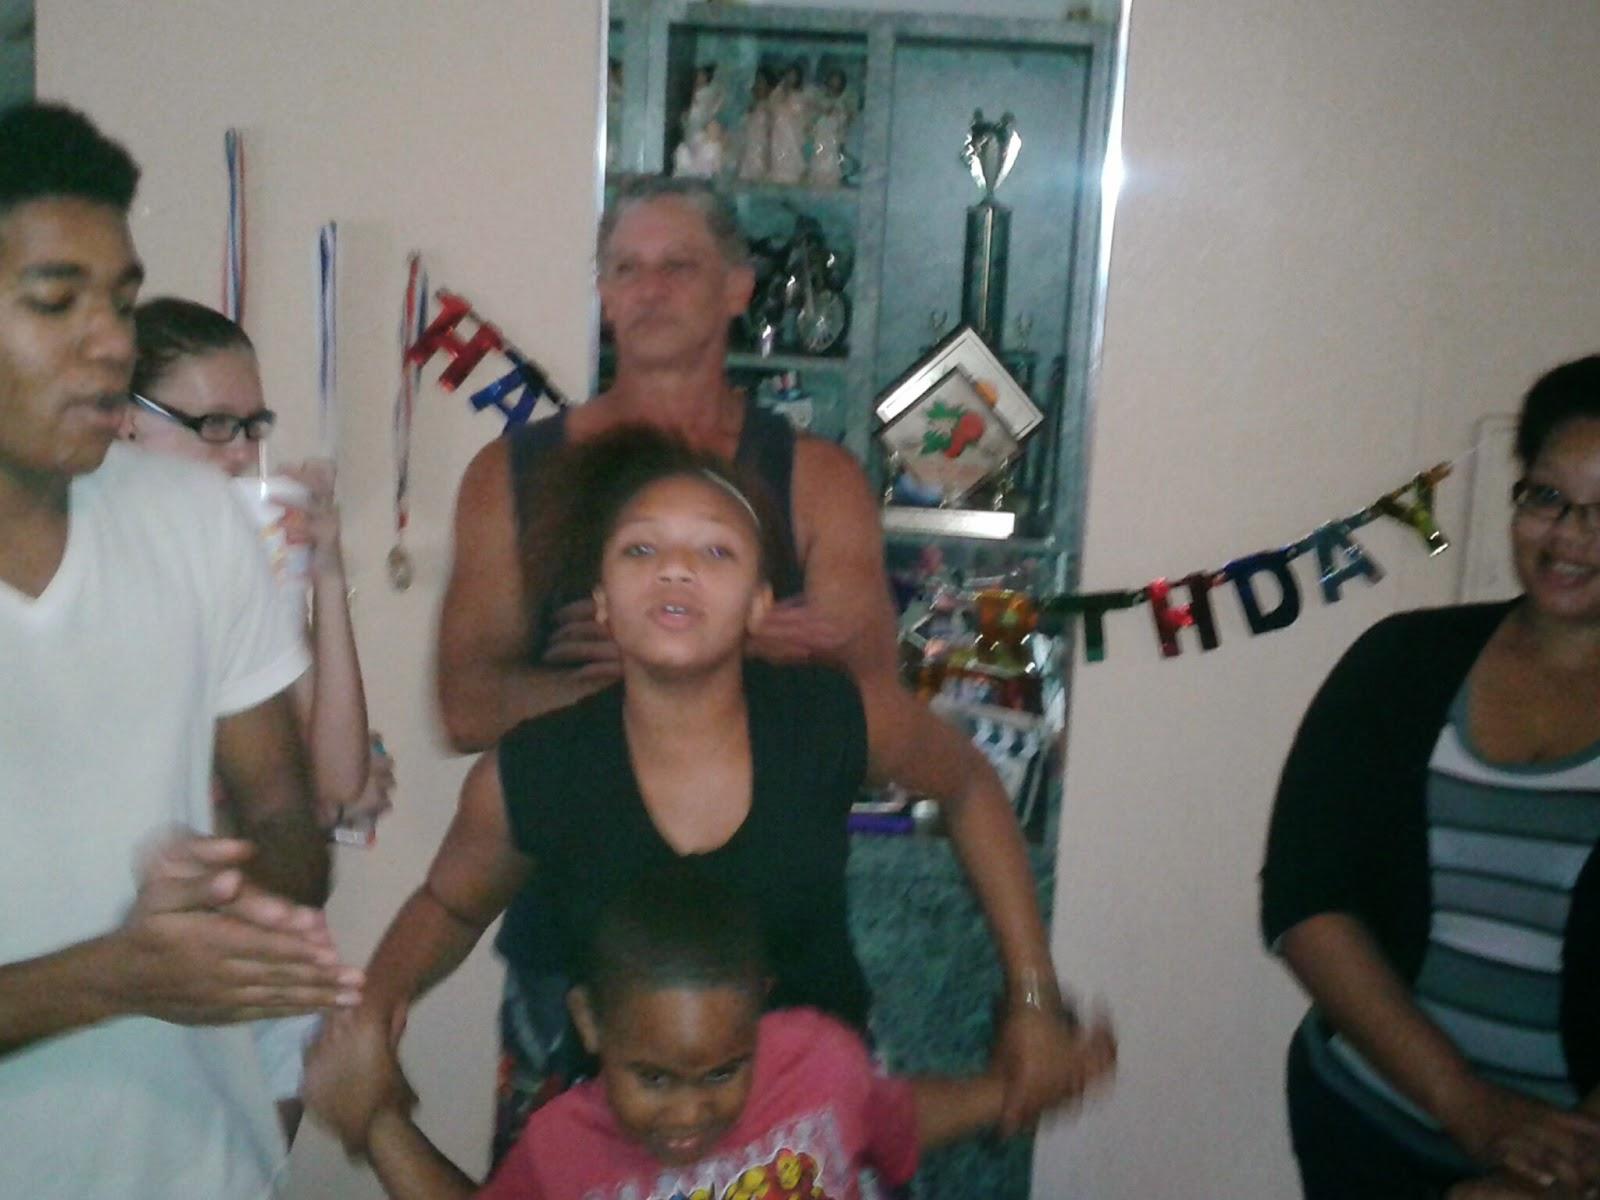 Making merry at Adam's birthday - Cake time